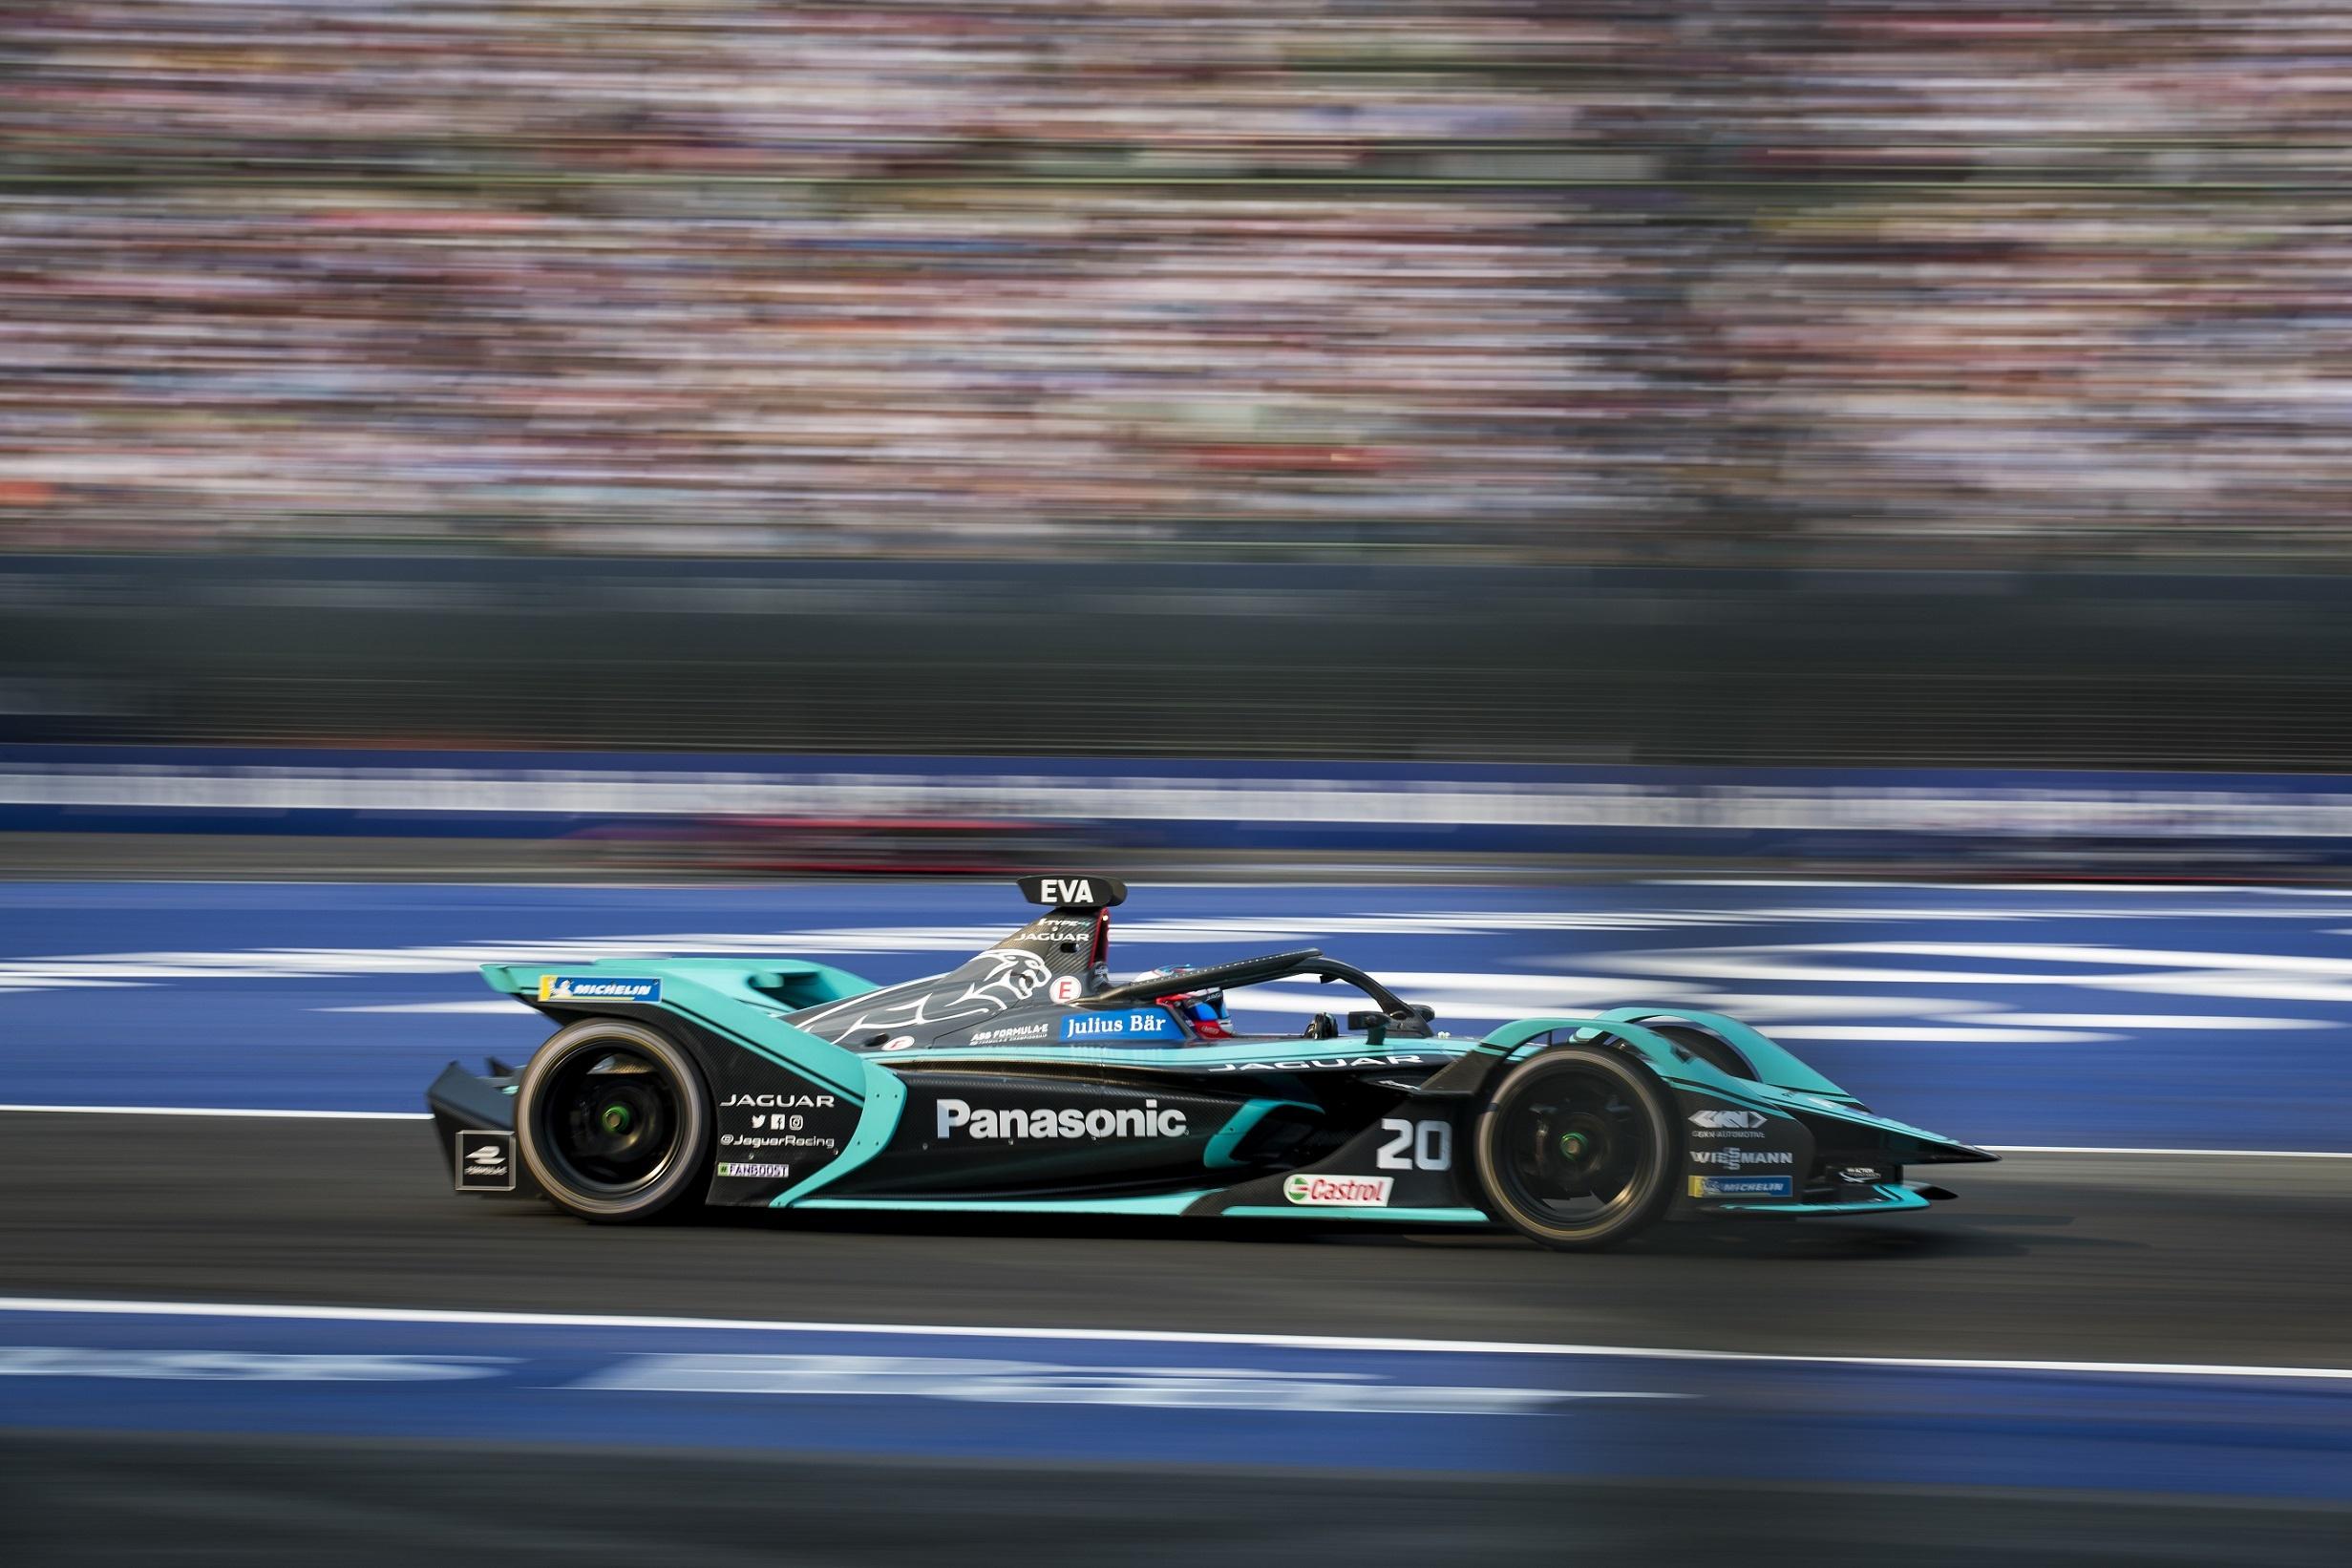 Panasonic jaguar racing head to berlin for a lockdown showdown